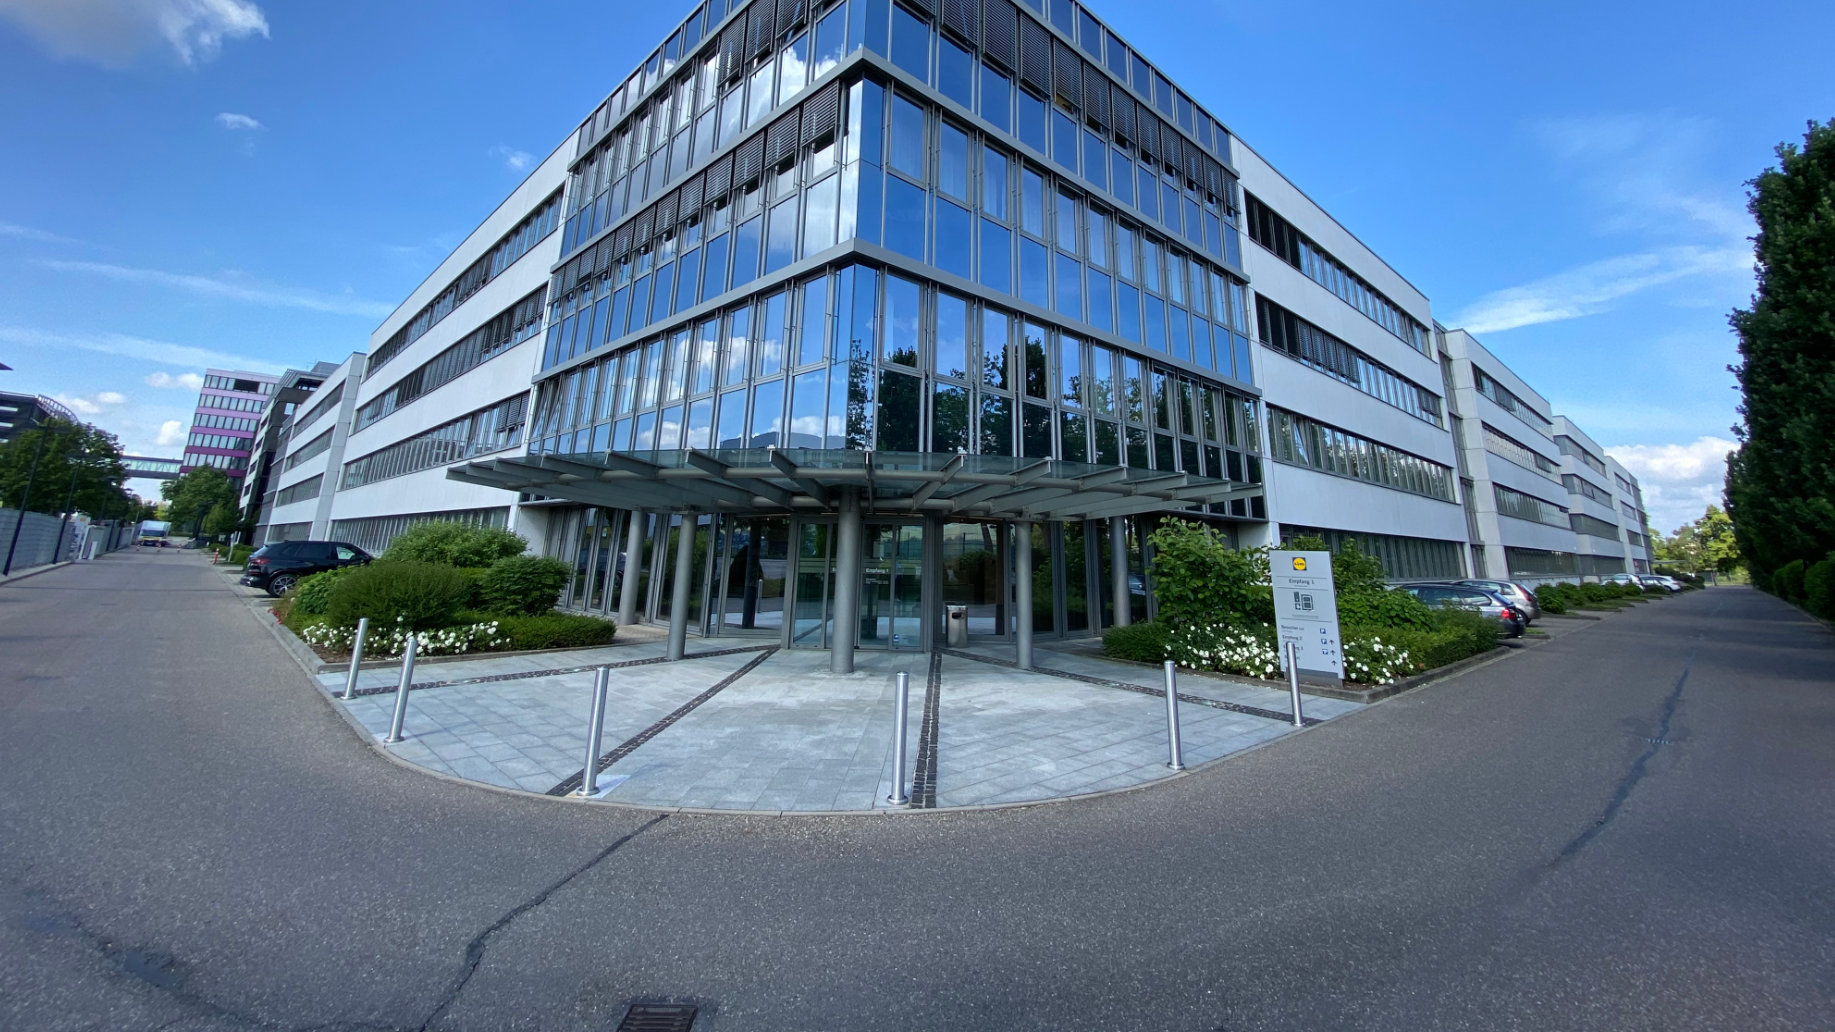 Lidl Neckarsulm Verwaltung